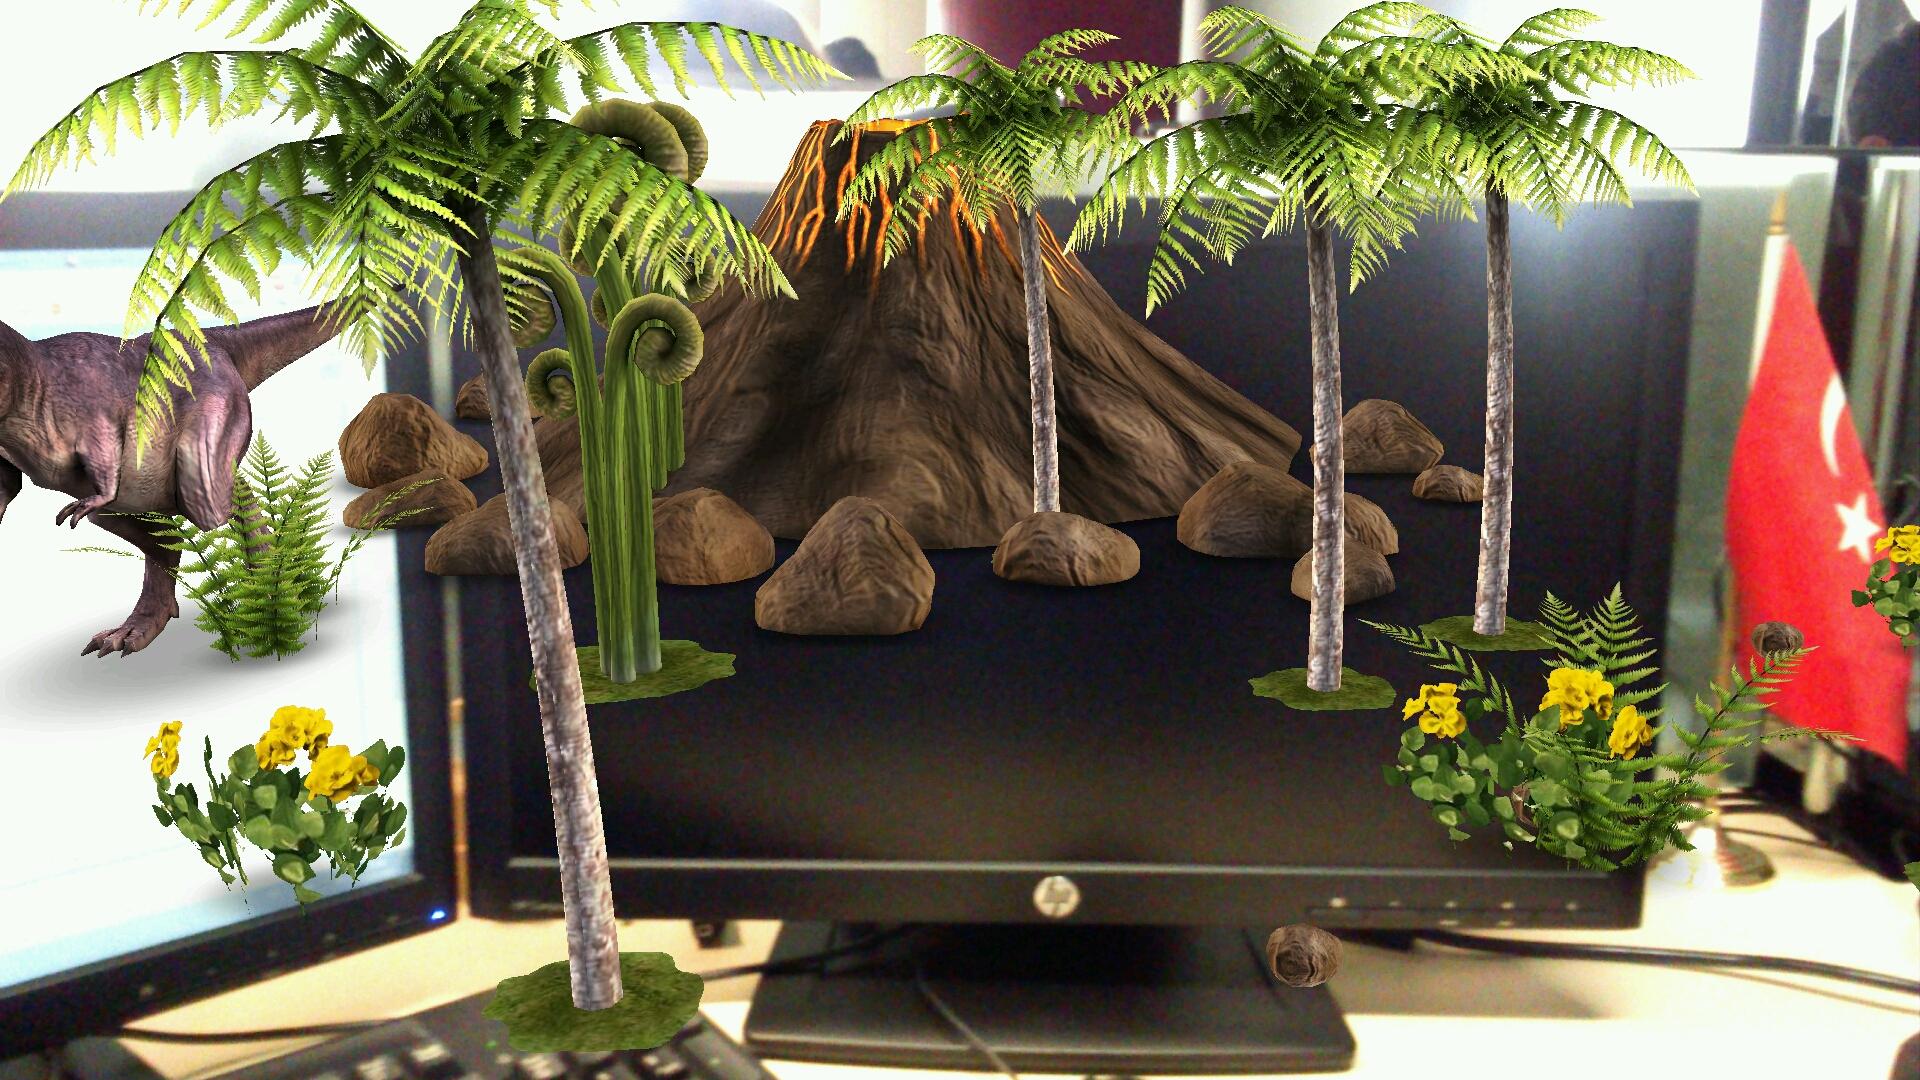 Sony Xperia E3 ile �ekilen �rnek foto�raflar